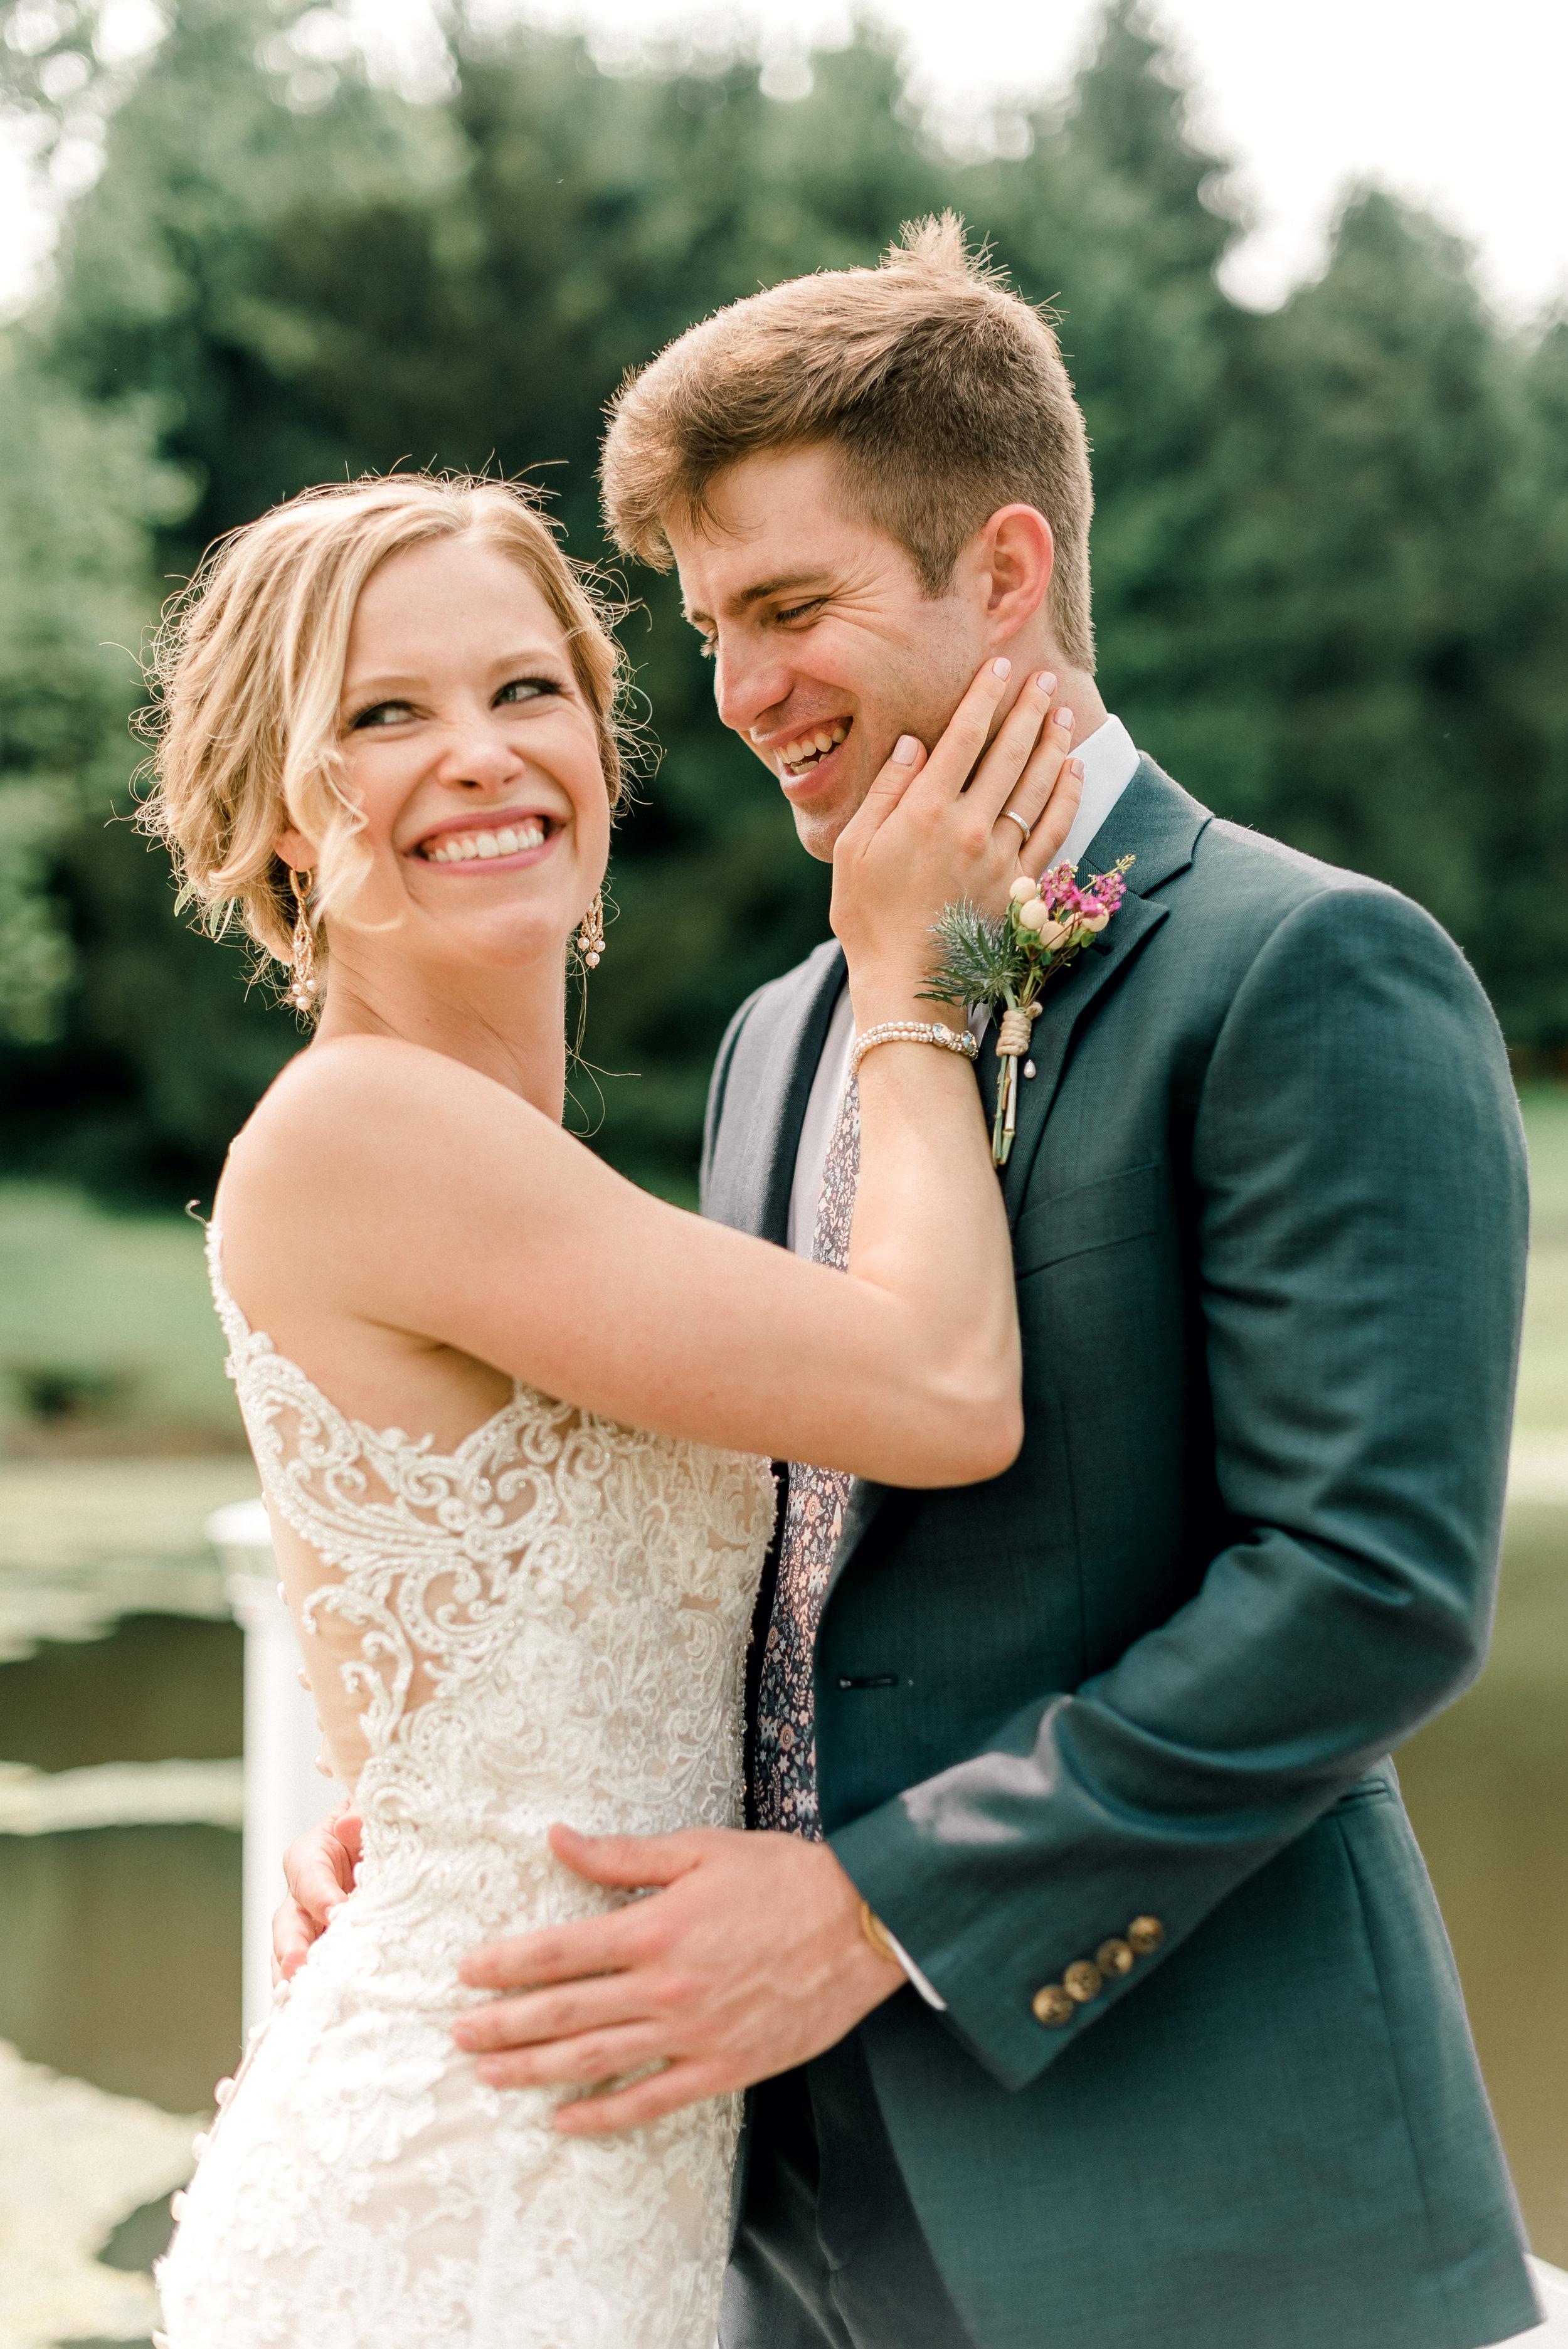 pittsburgh-wedding-photographer-shady-elms-farm-0033.jpg